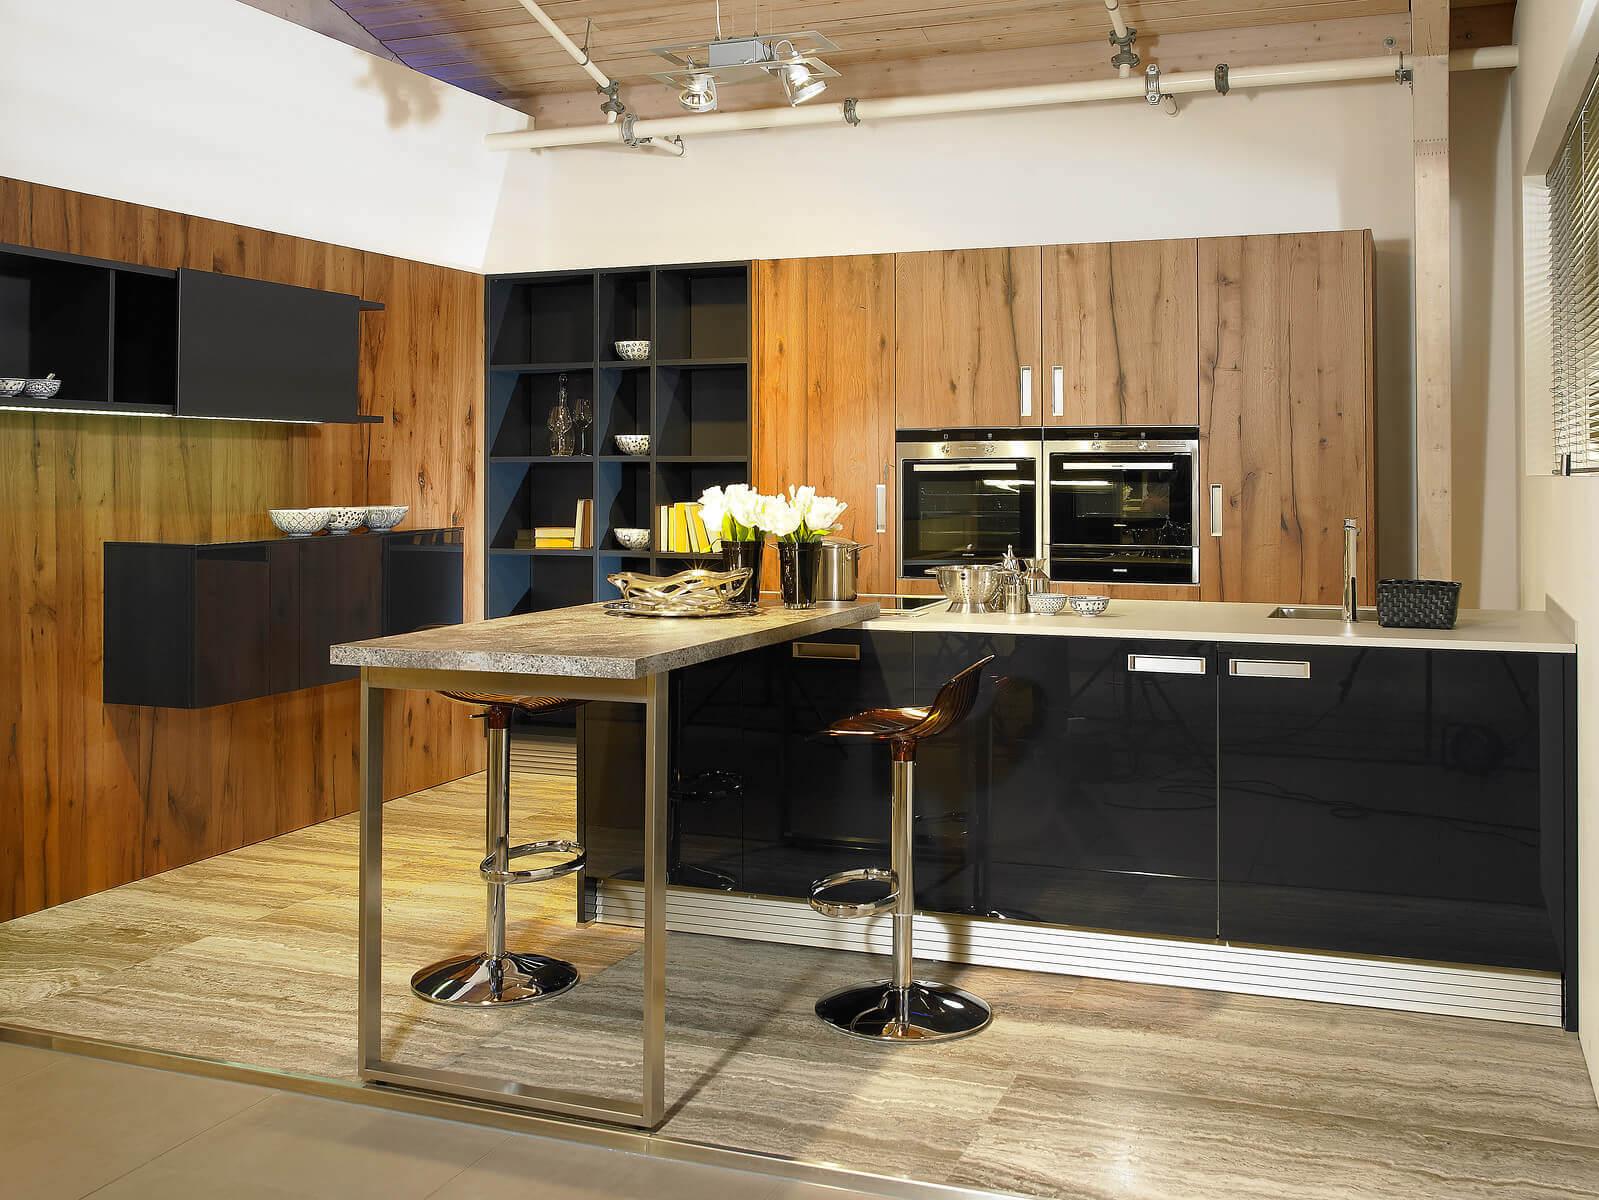 Hoogglans keuken Next125 indigo blauw